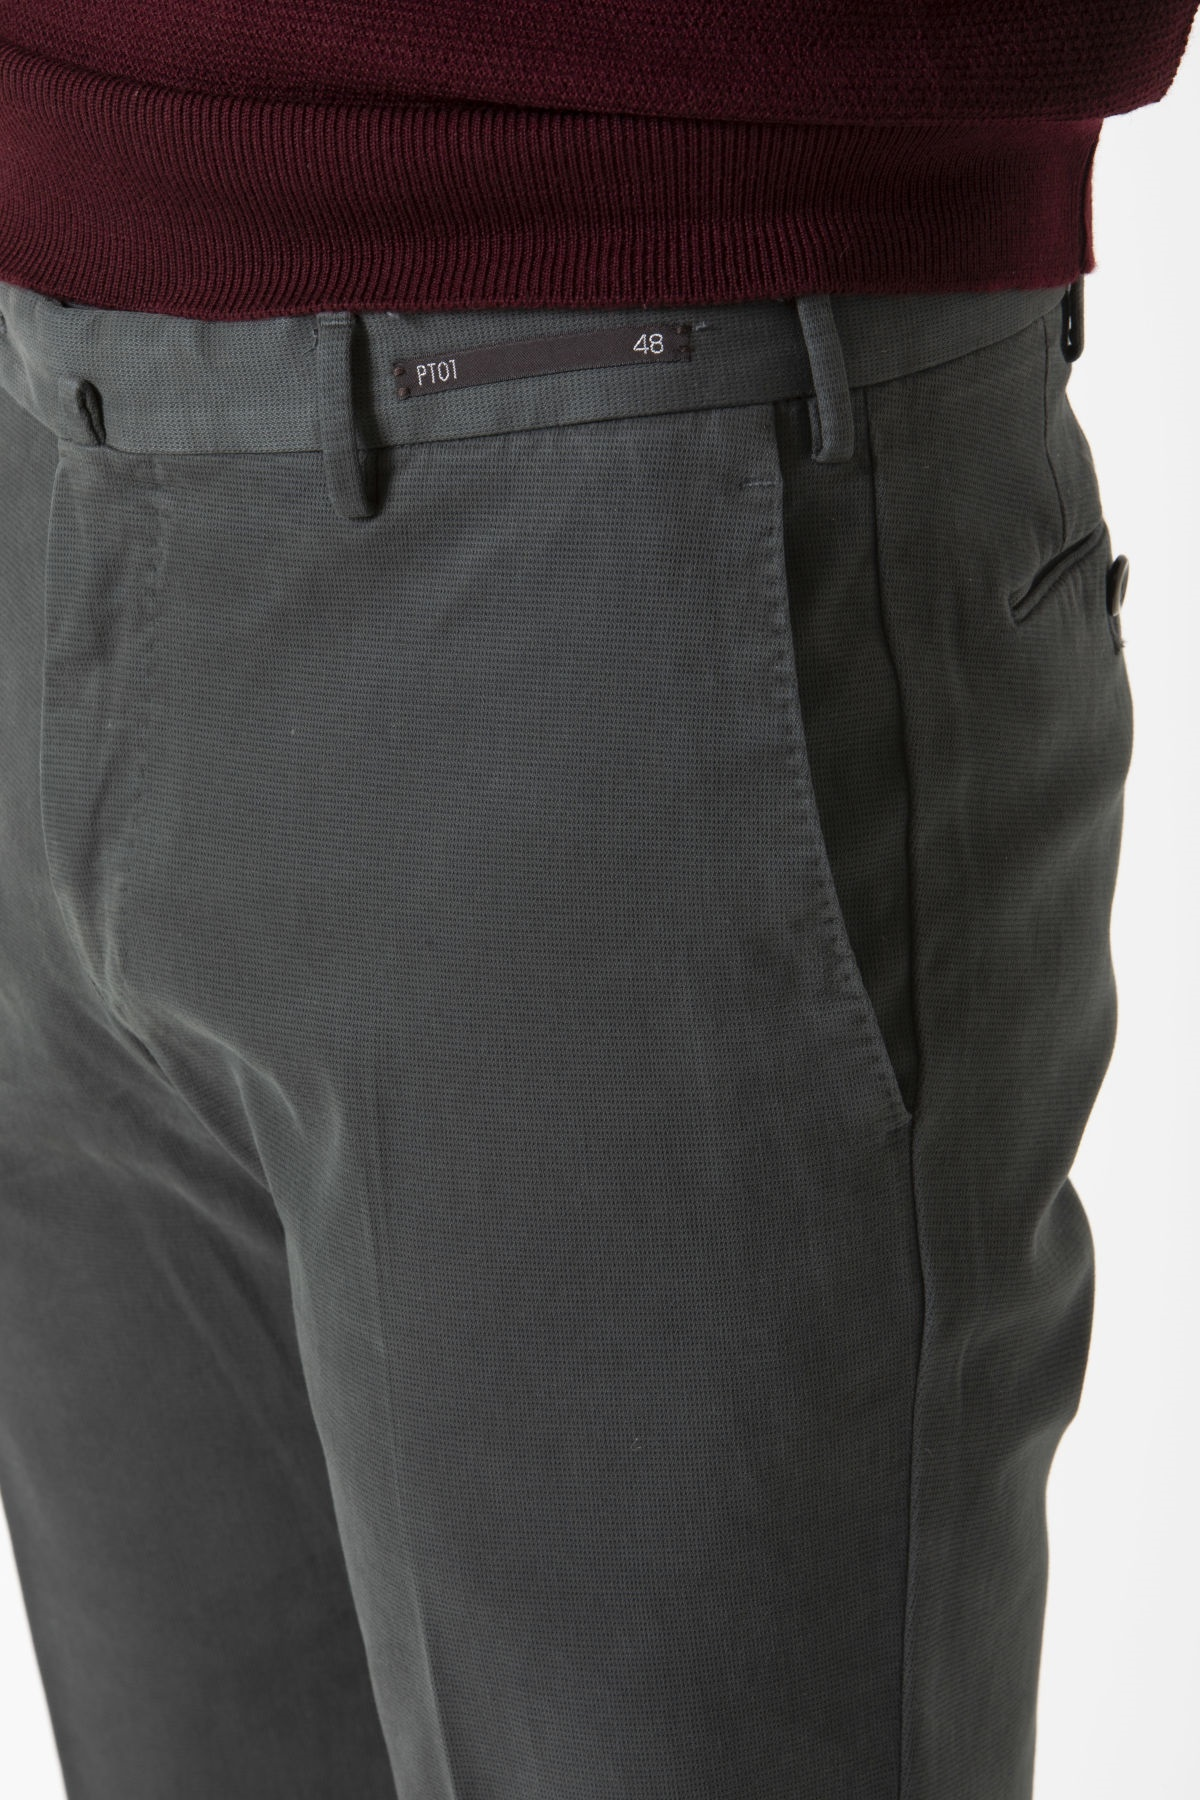 Pantaloni BUSINESS per uomo PT01 A/I